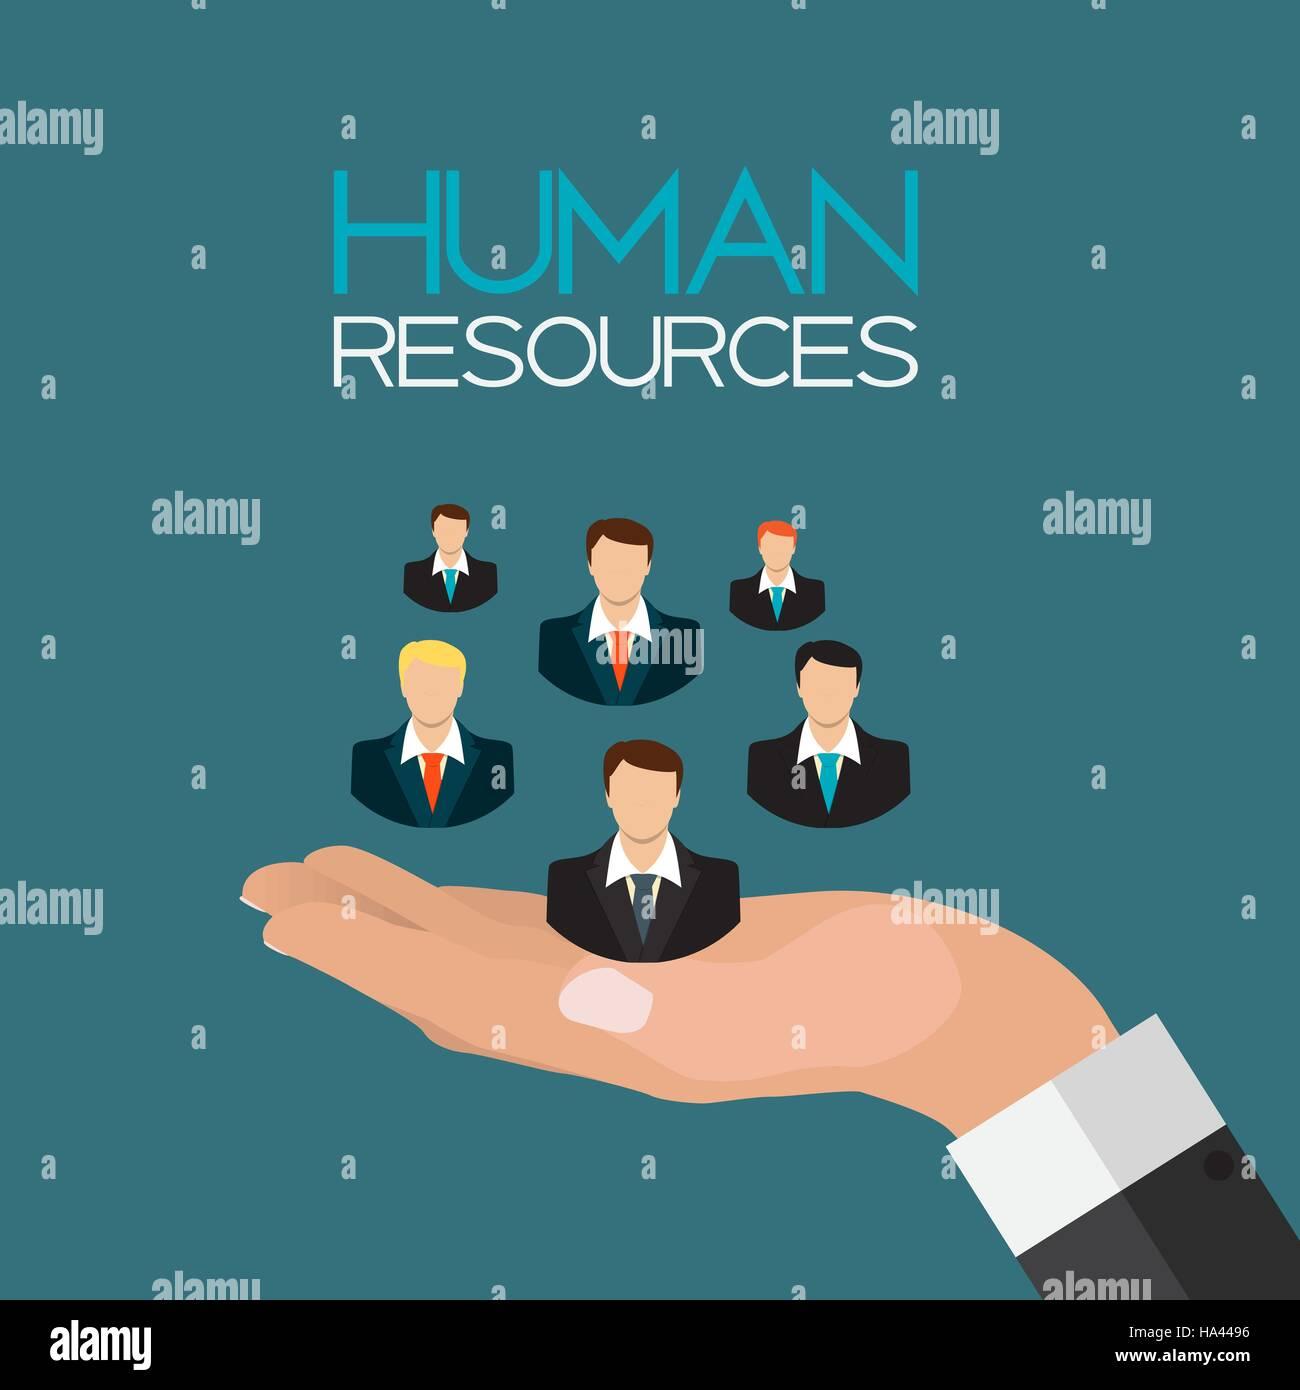 Human Resources Concept Flat Design. Vector Illustration - Stock Vector